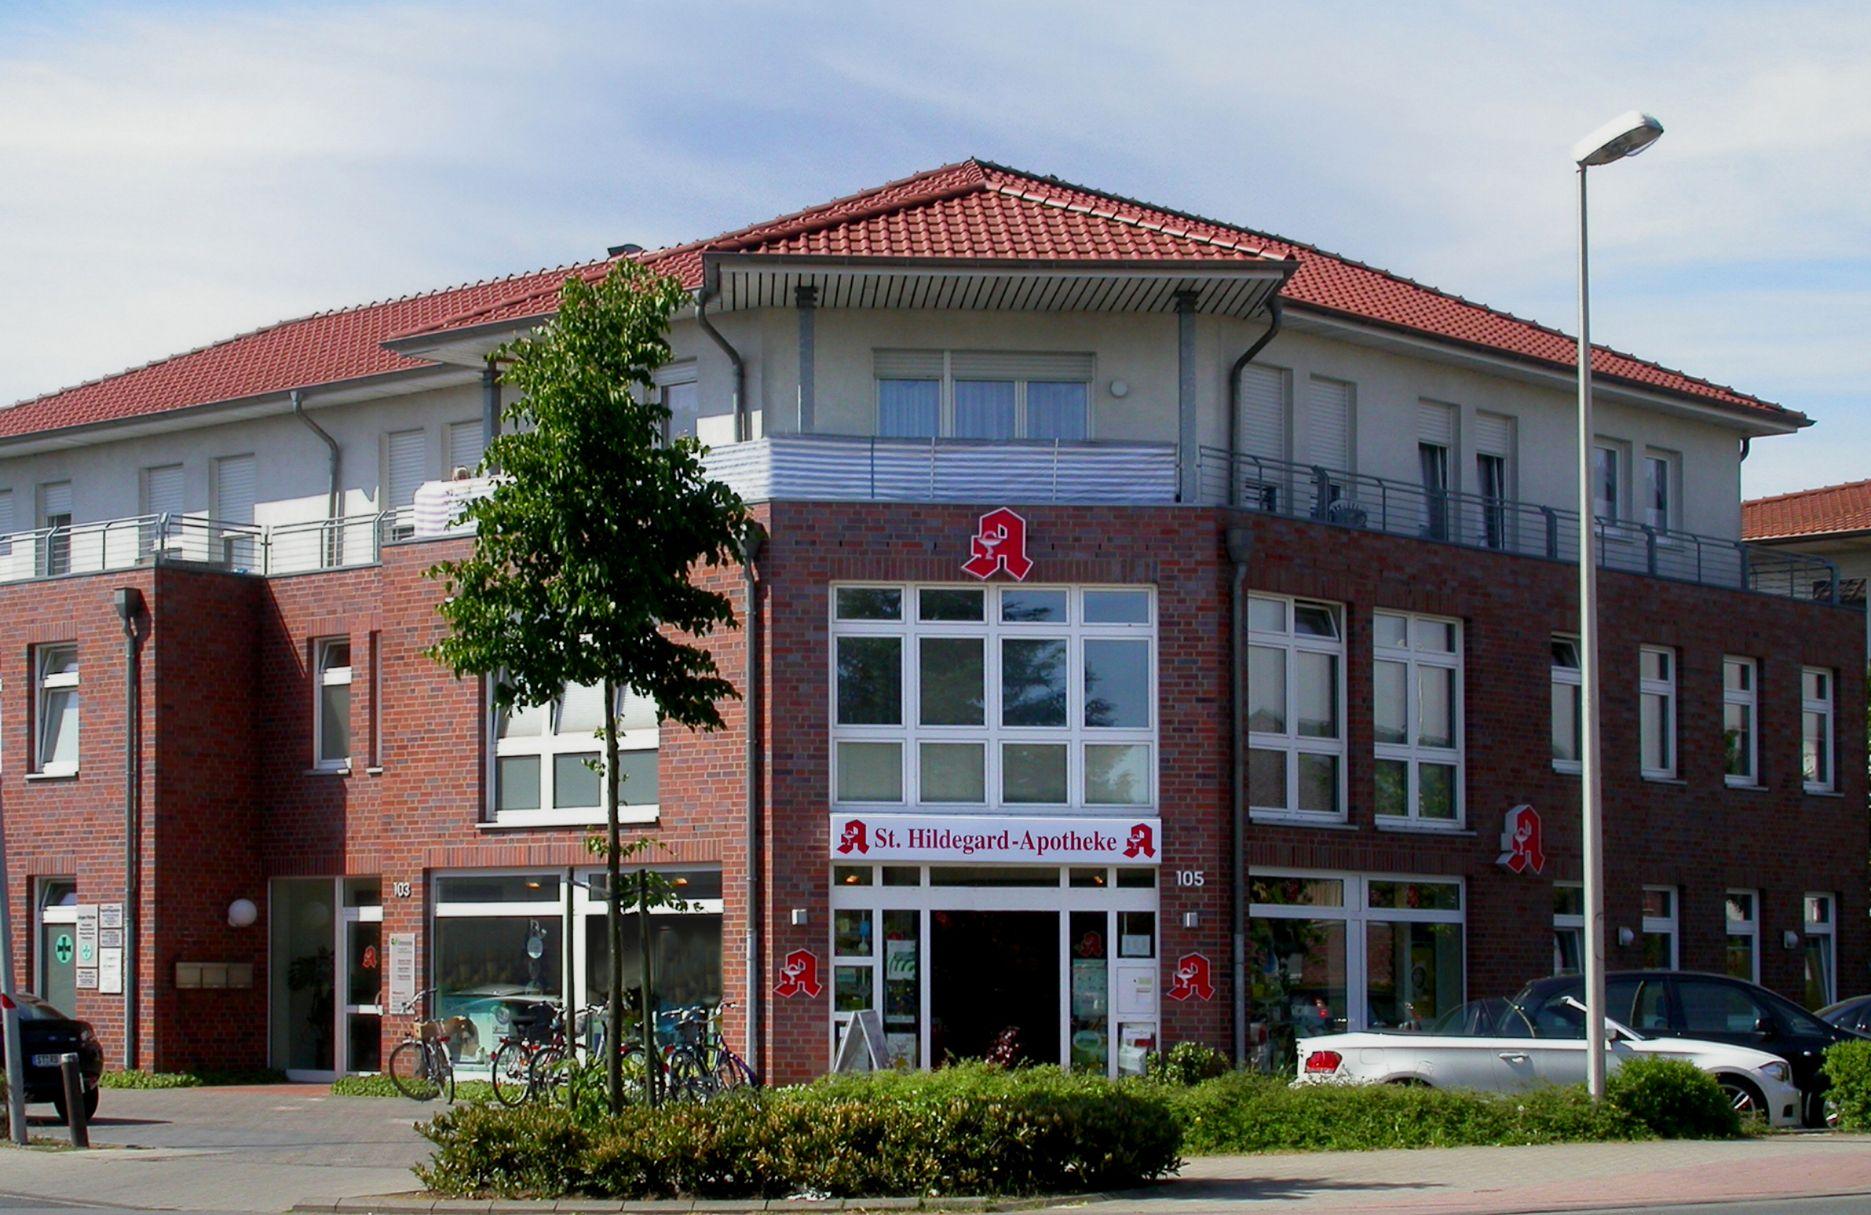 St-Hildegard-Apotheke